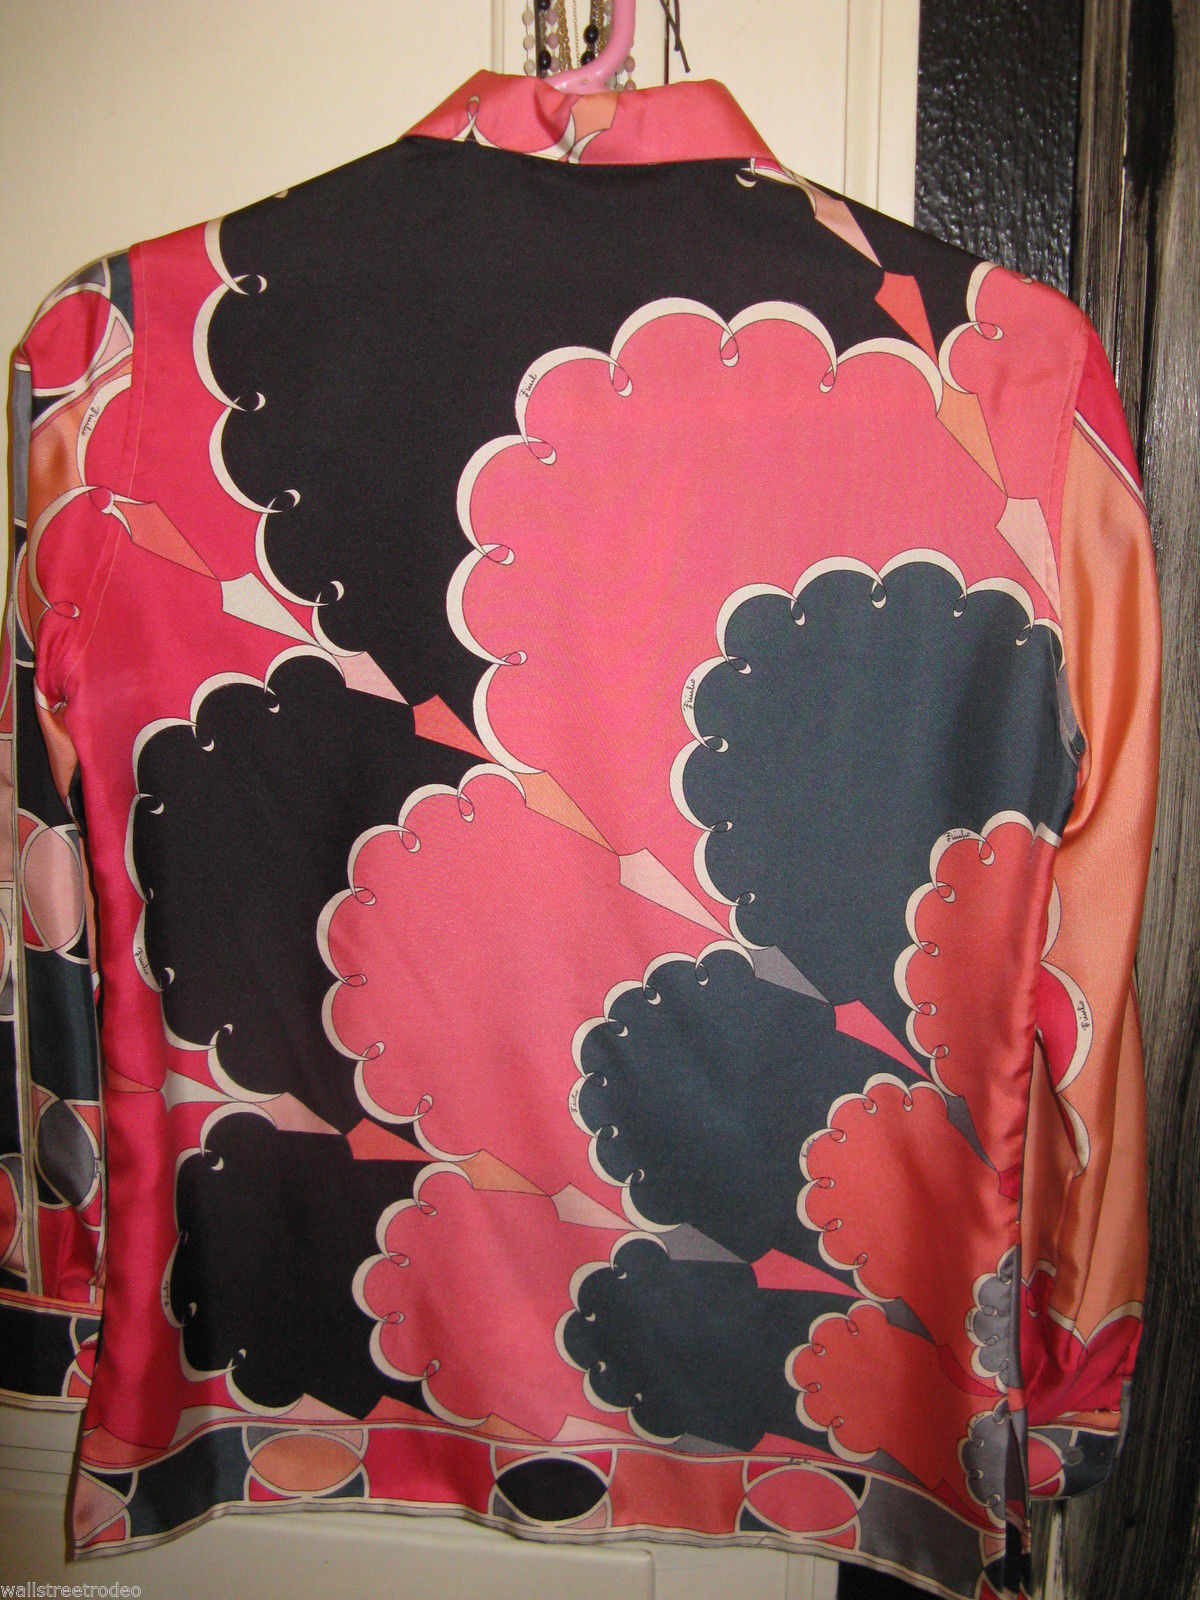 Vintage Emilio Pucci Saks fifth Avenue Iconic pop art silk 1960s Italy shirt 8 image 2